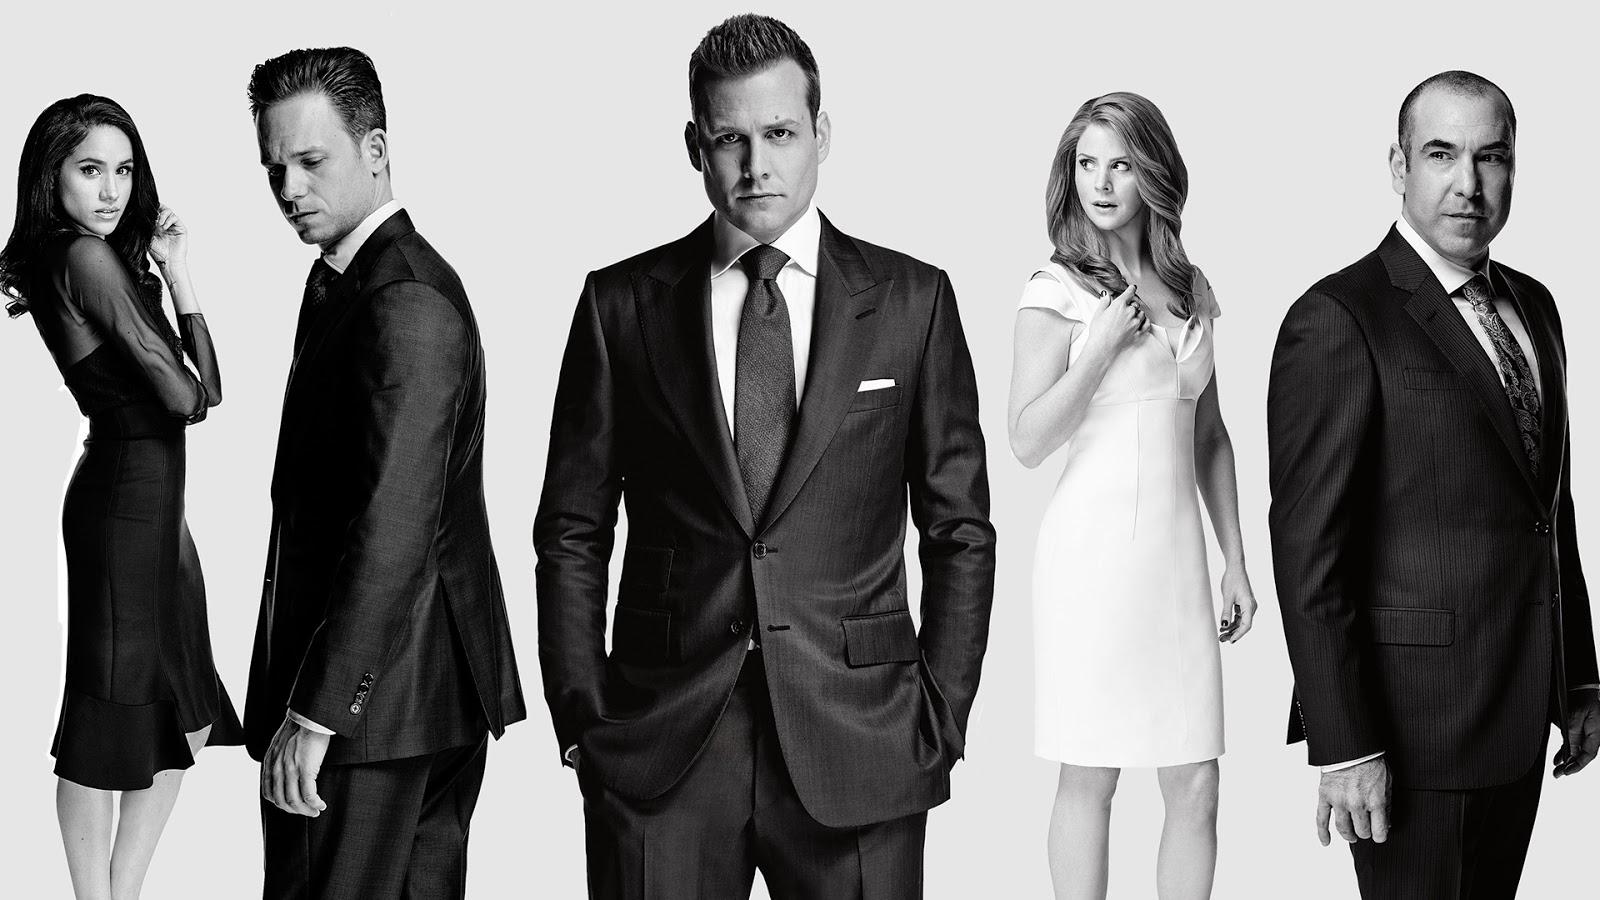 Rachel Zane, Mike Ross, Harvey Specter, Donna Paulsen y Louis Litt en un poster promocional de la temporada siete de Suits